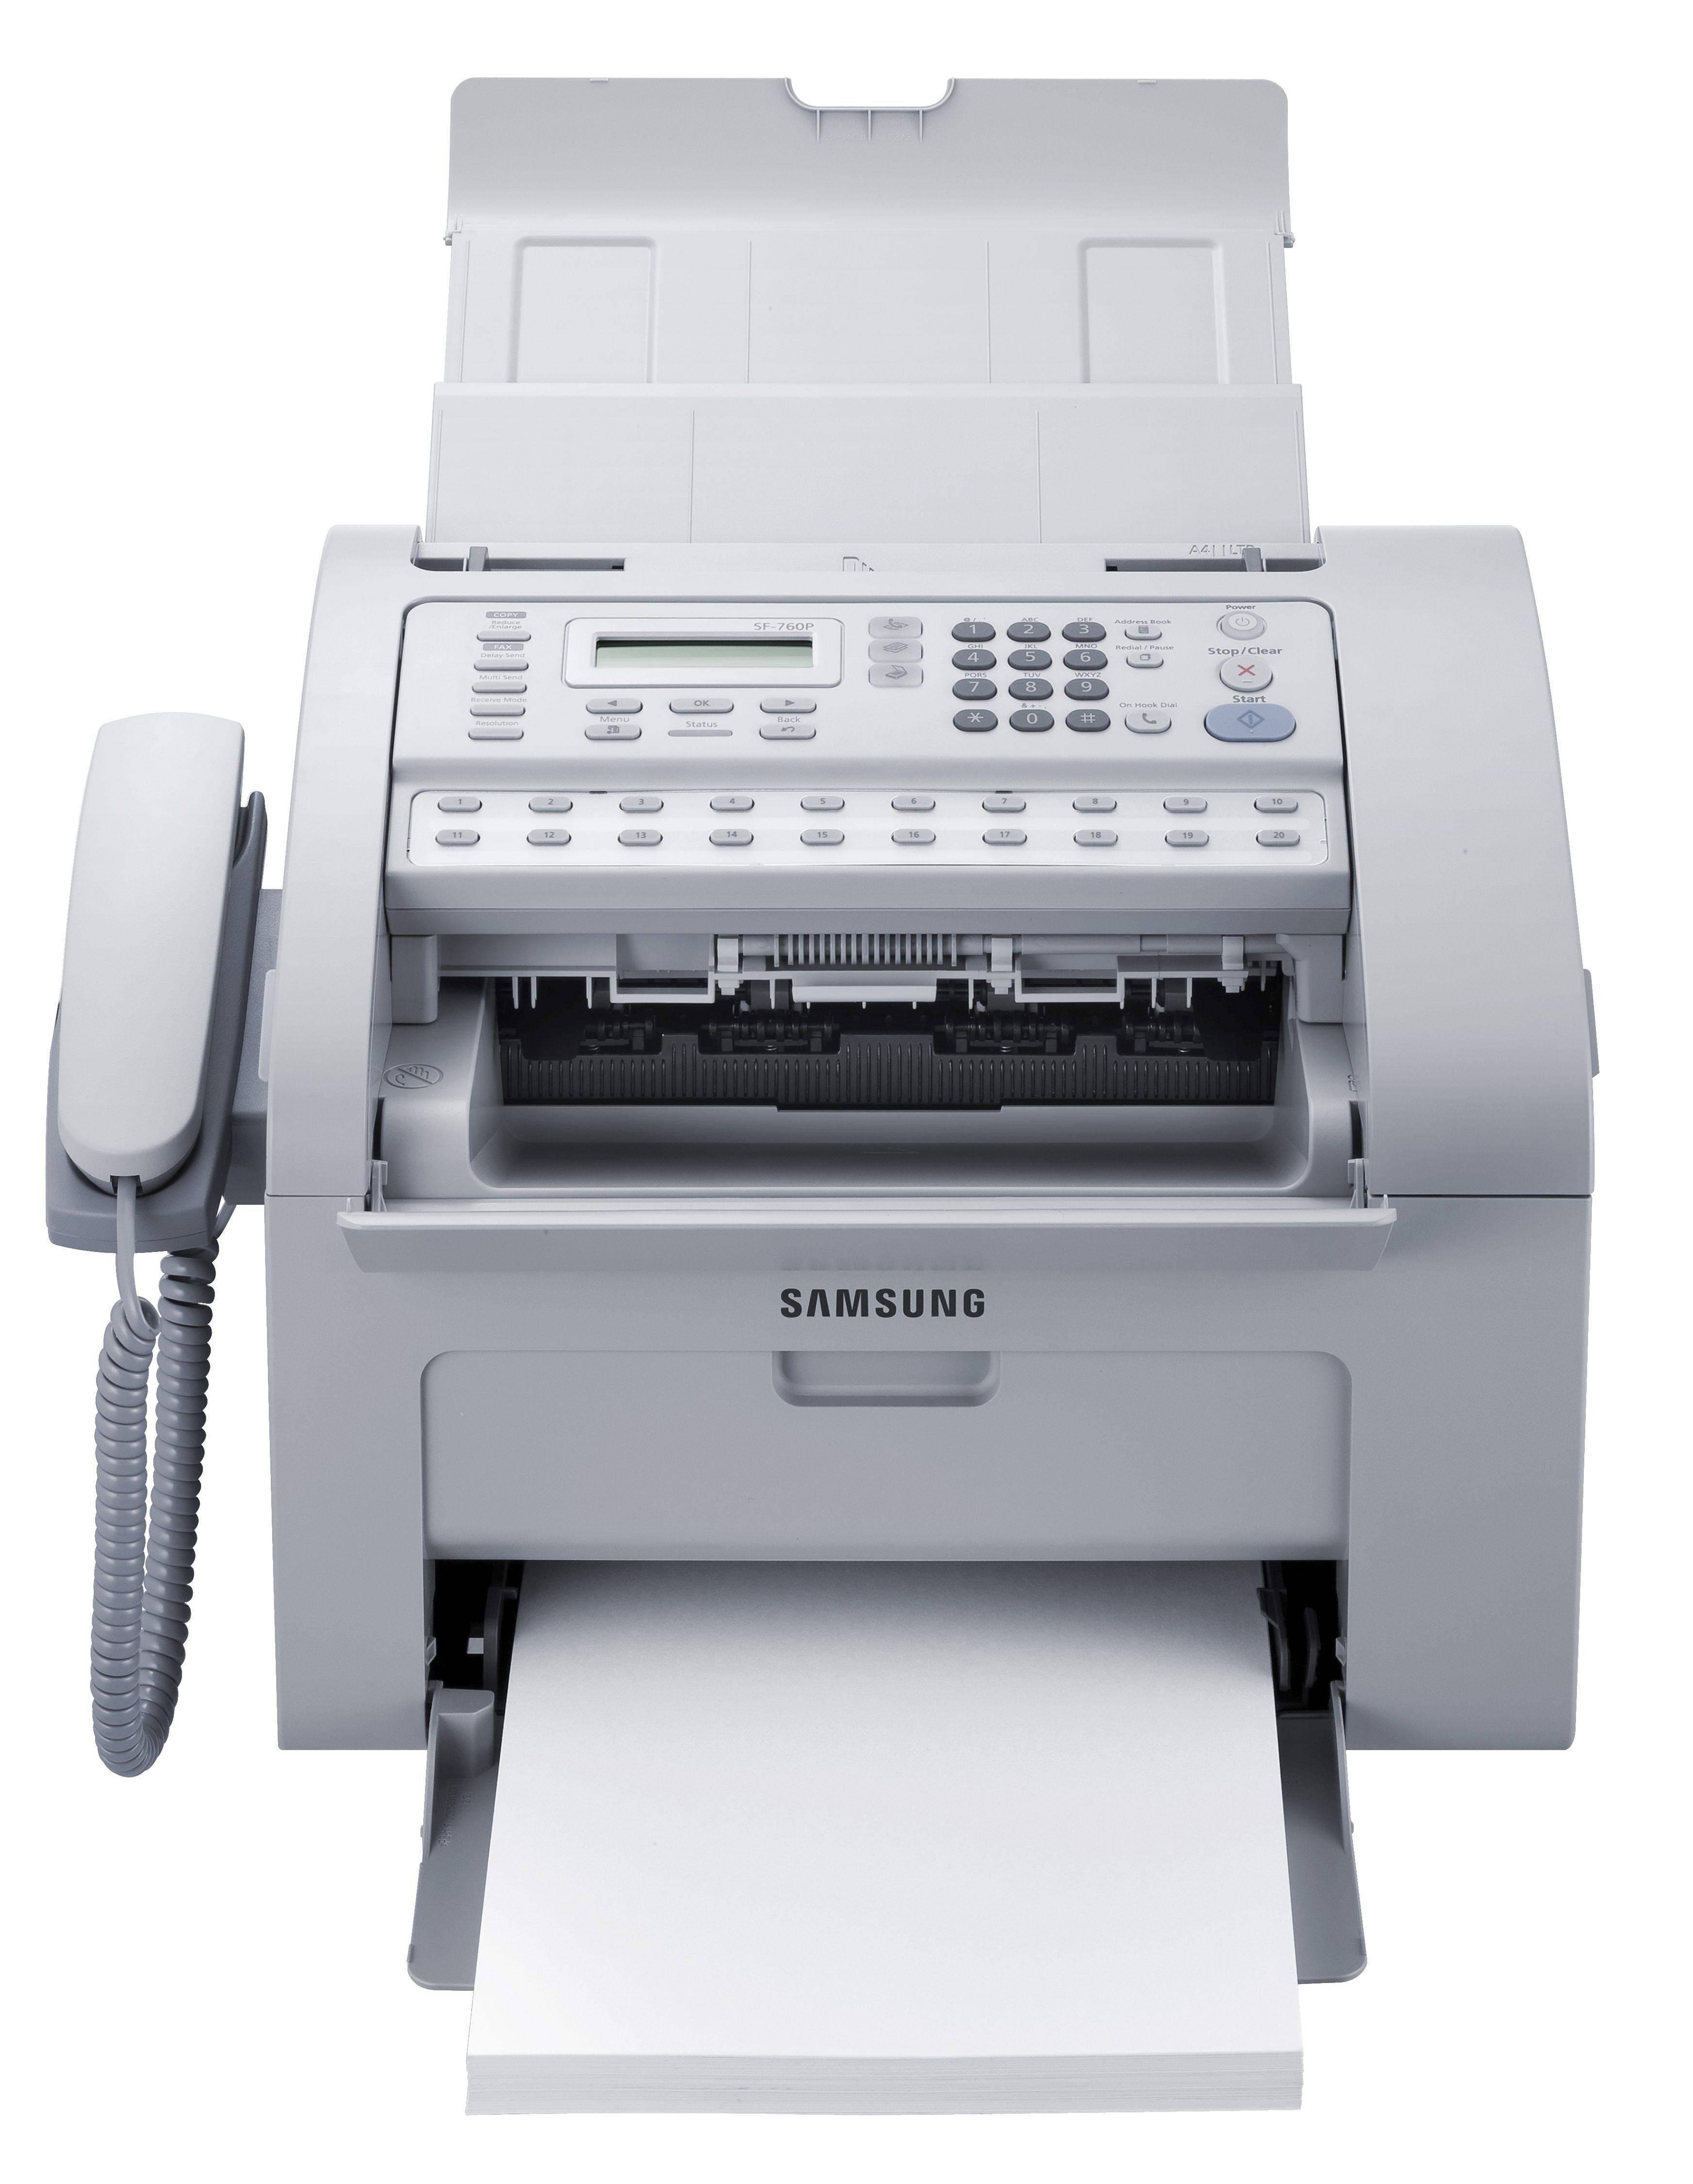 Samsung Printing Online Drucker »SAMSUNG SF-760P mono Fax 4in1 USB2.0 (SF-760P/SEE)«